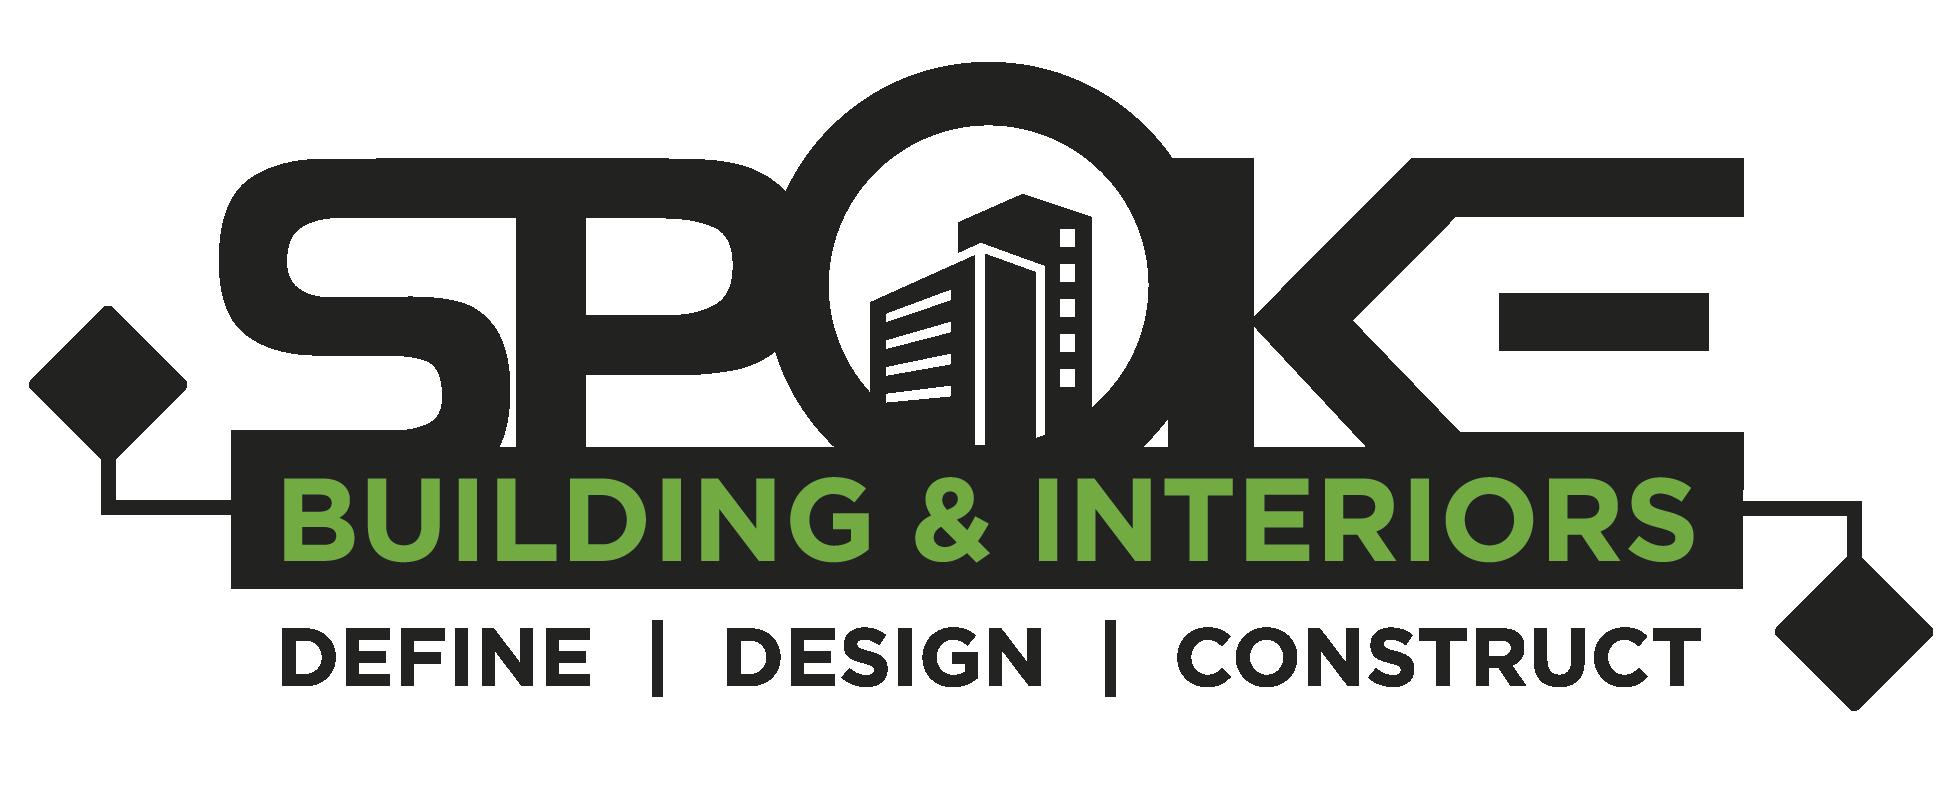 Spoke Building & Interiors